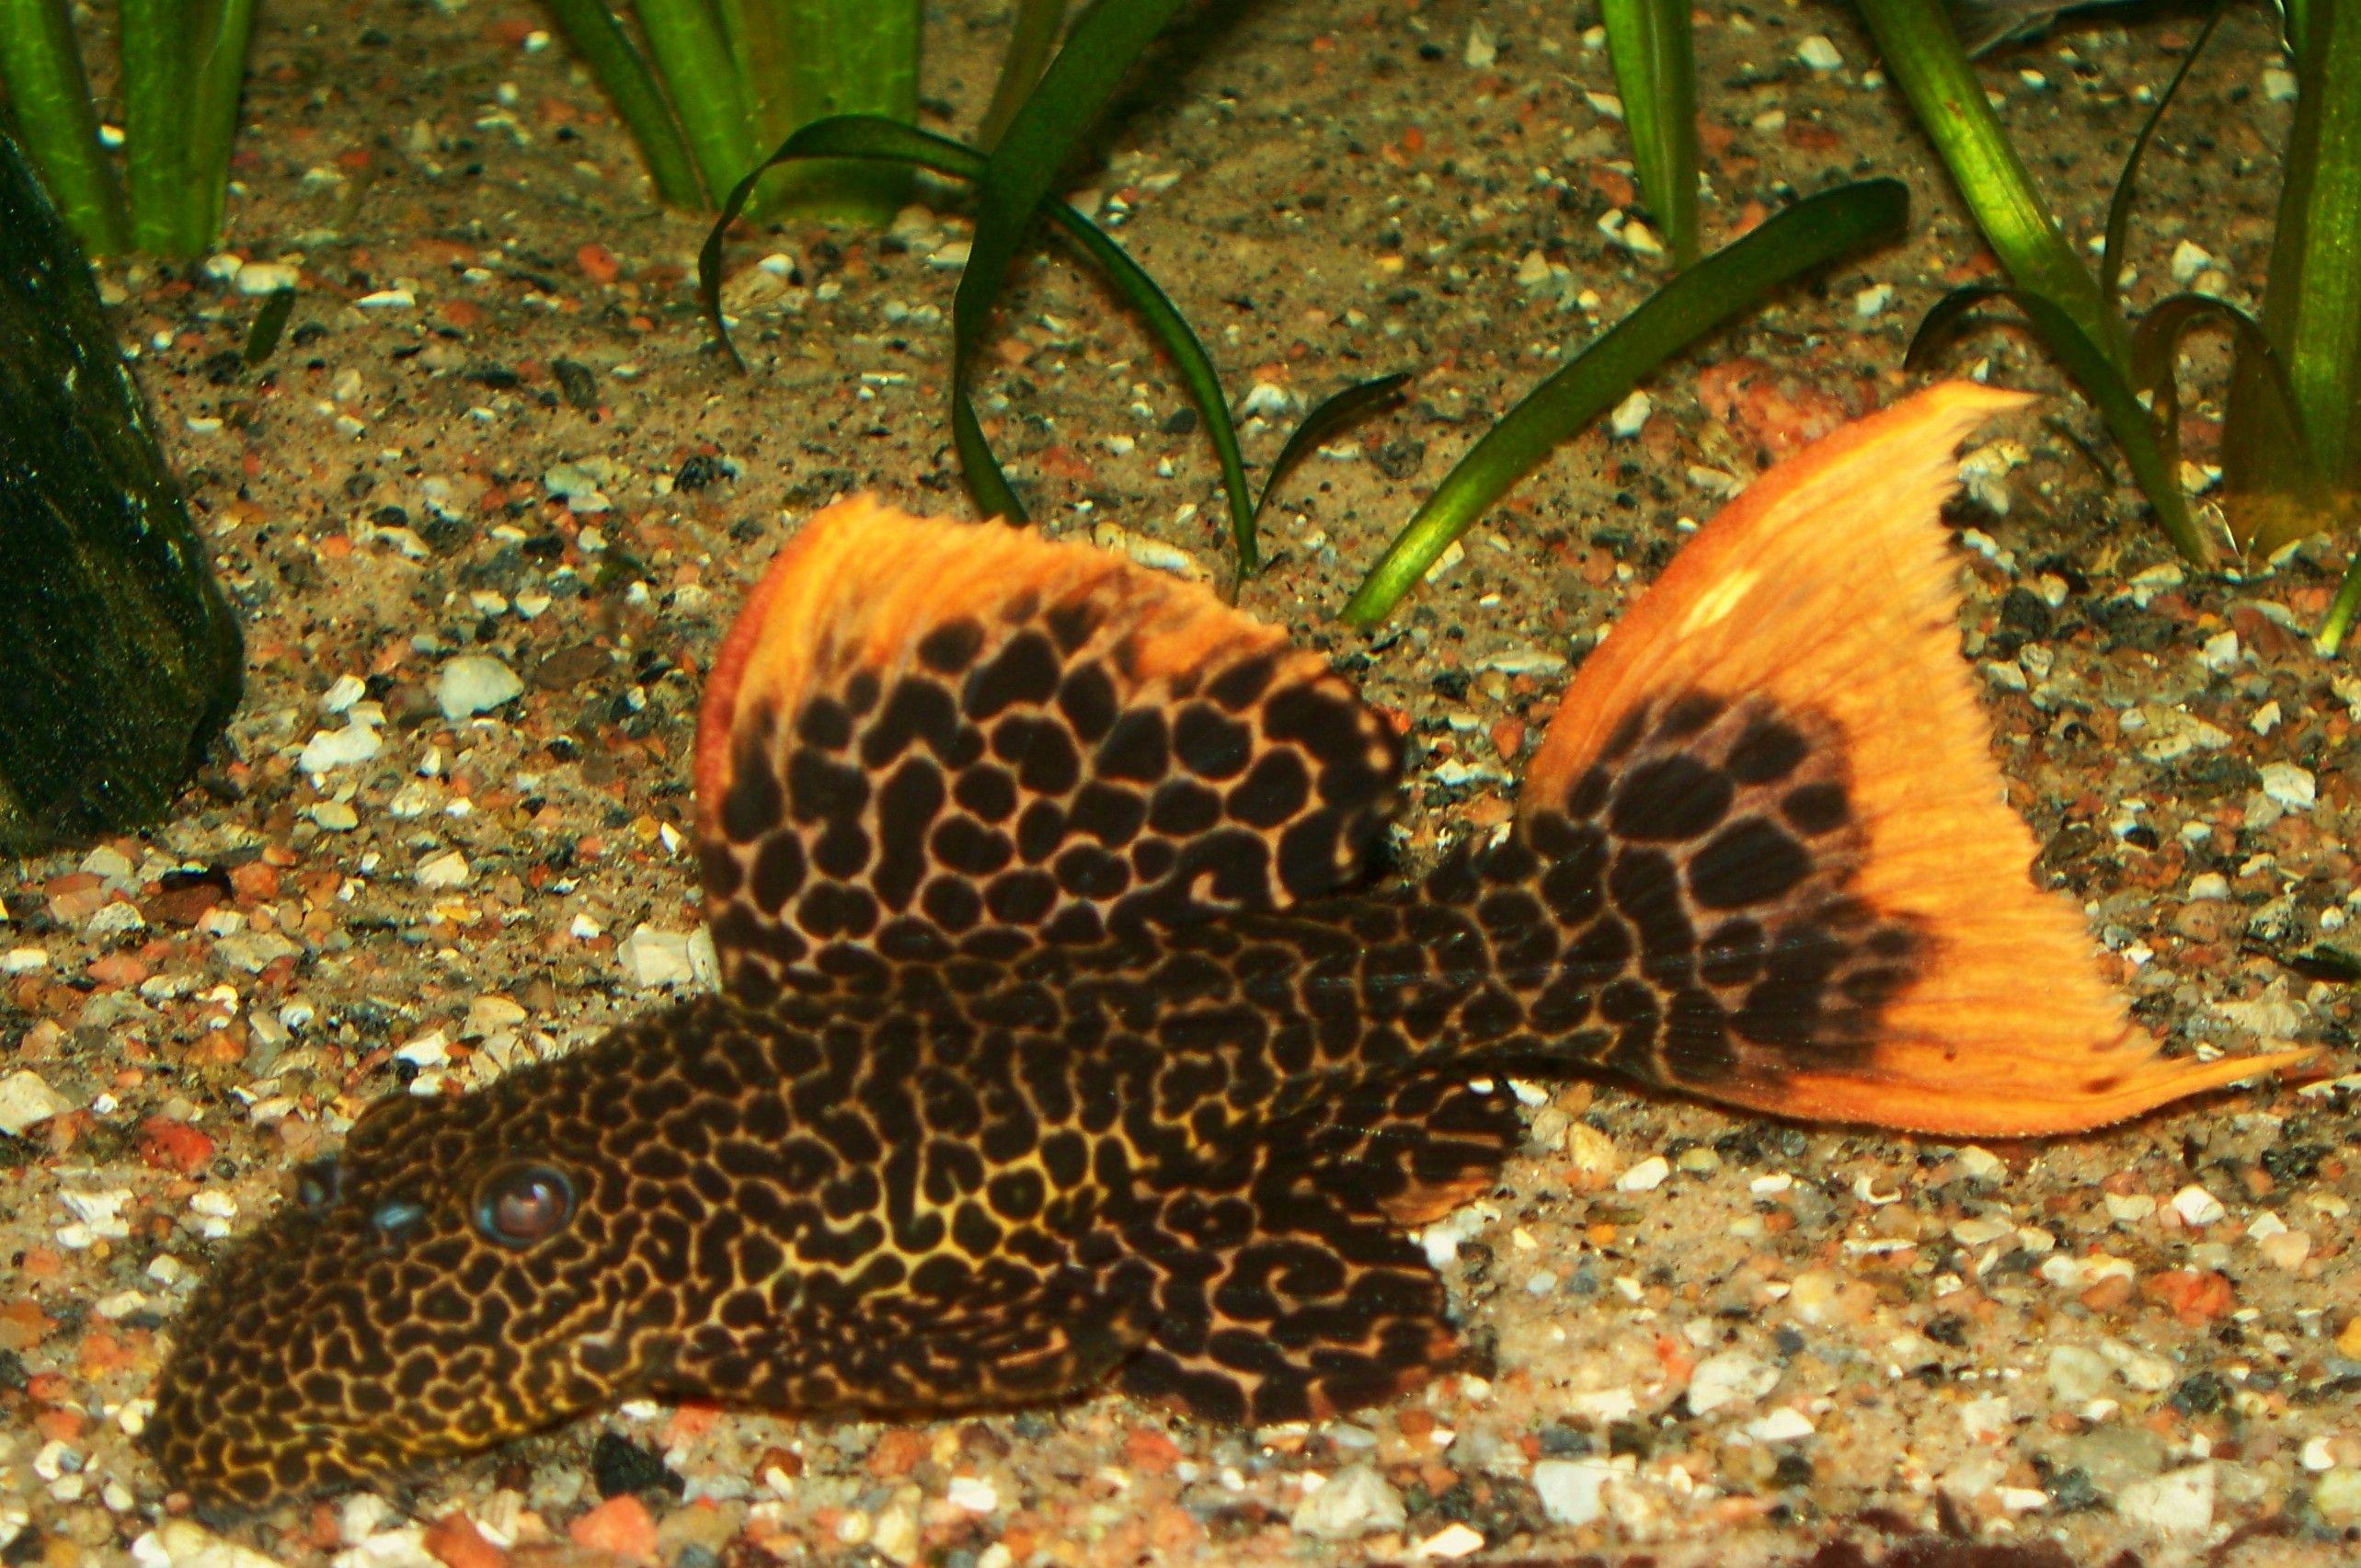 Cichlids Com L114 Redfin Leopard Pleco Tropical Freshwater Fish Aquarium Catfish Beautiful Fish